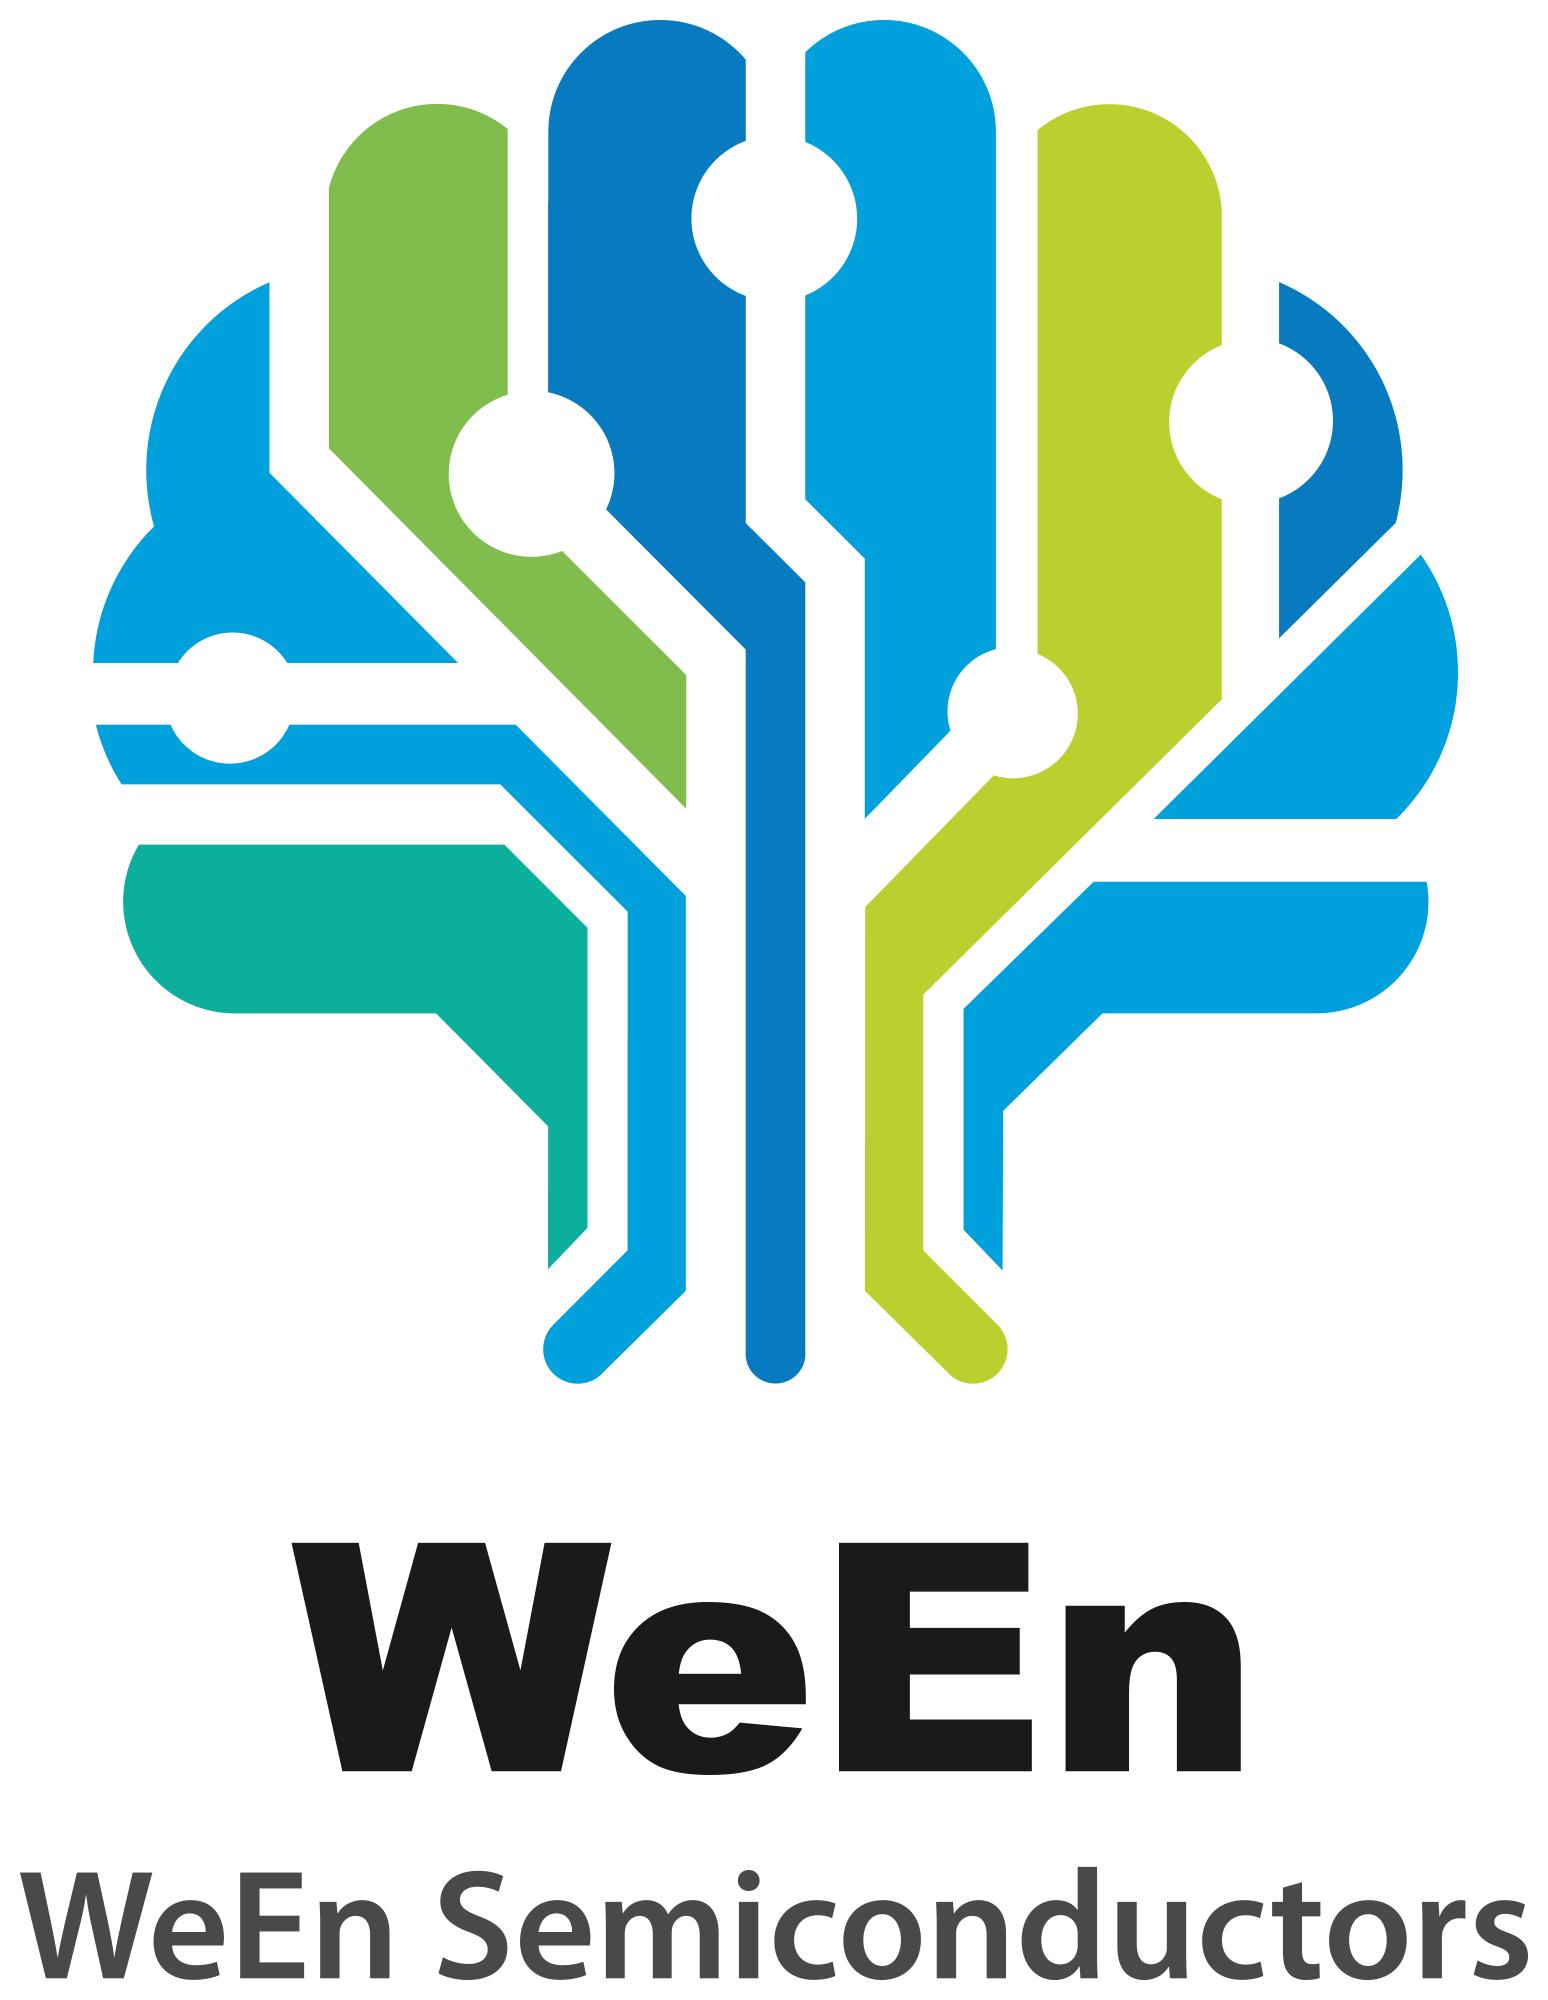 WeEn Semiconductors